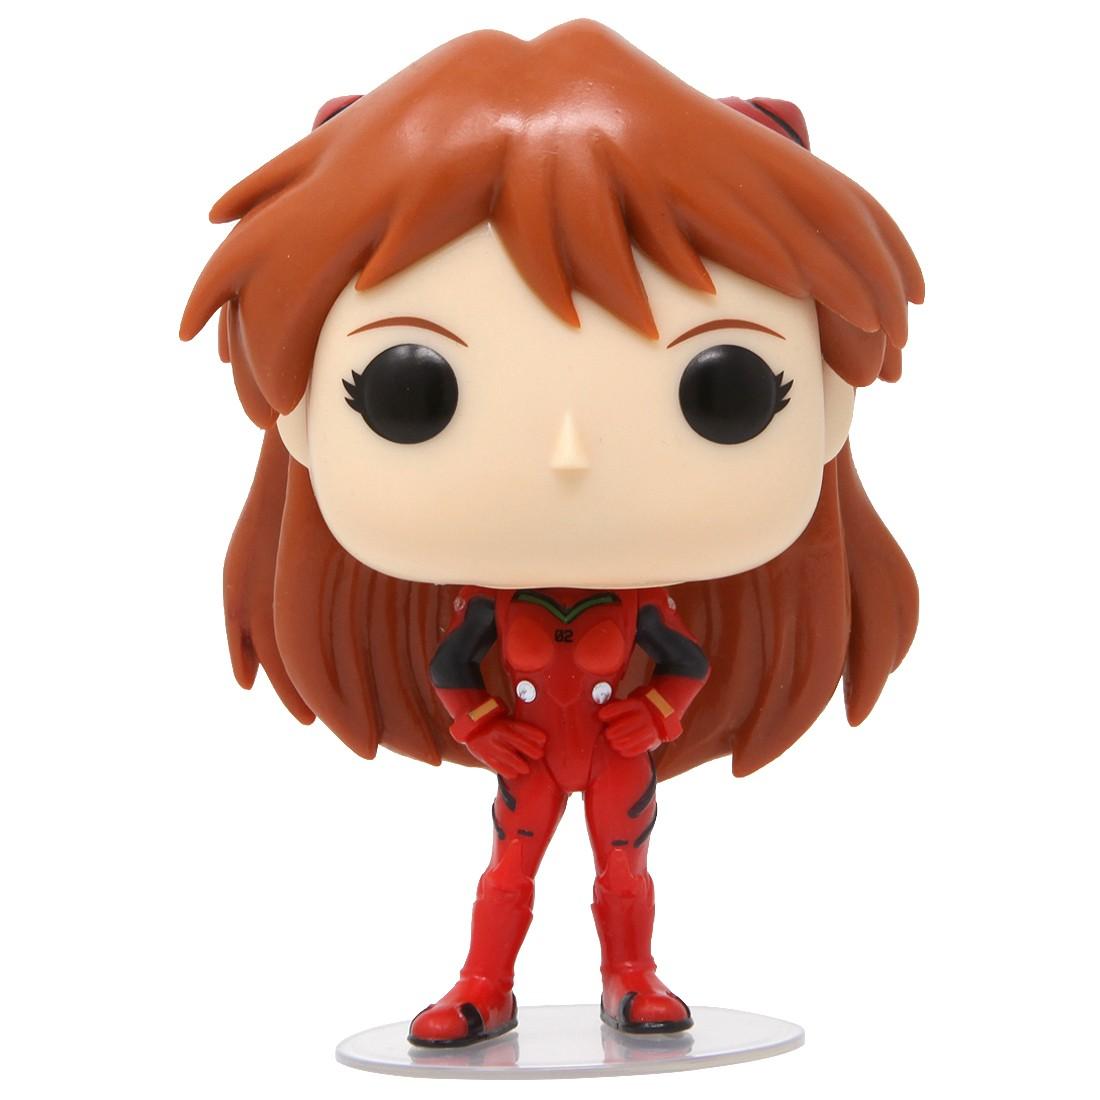 Funko POP Animation Evangelion - Asuka Langley Soryu (red)